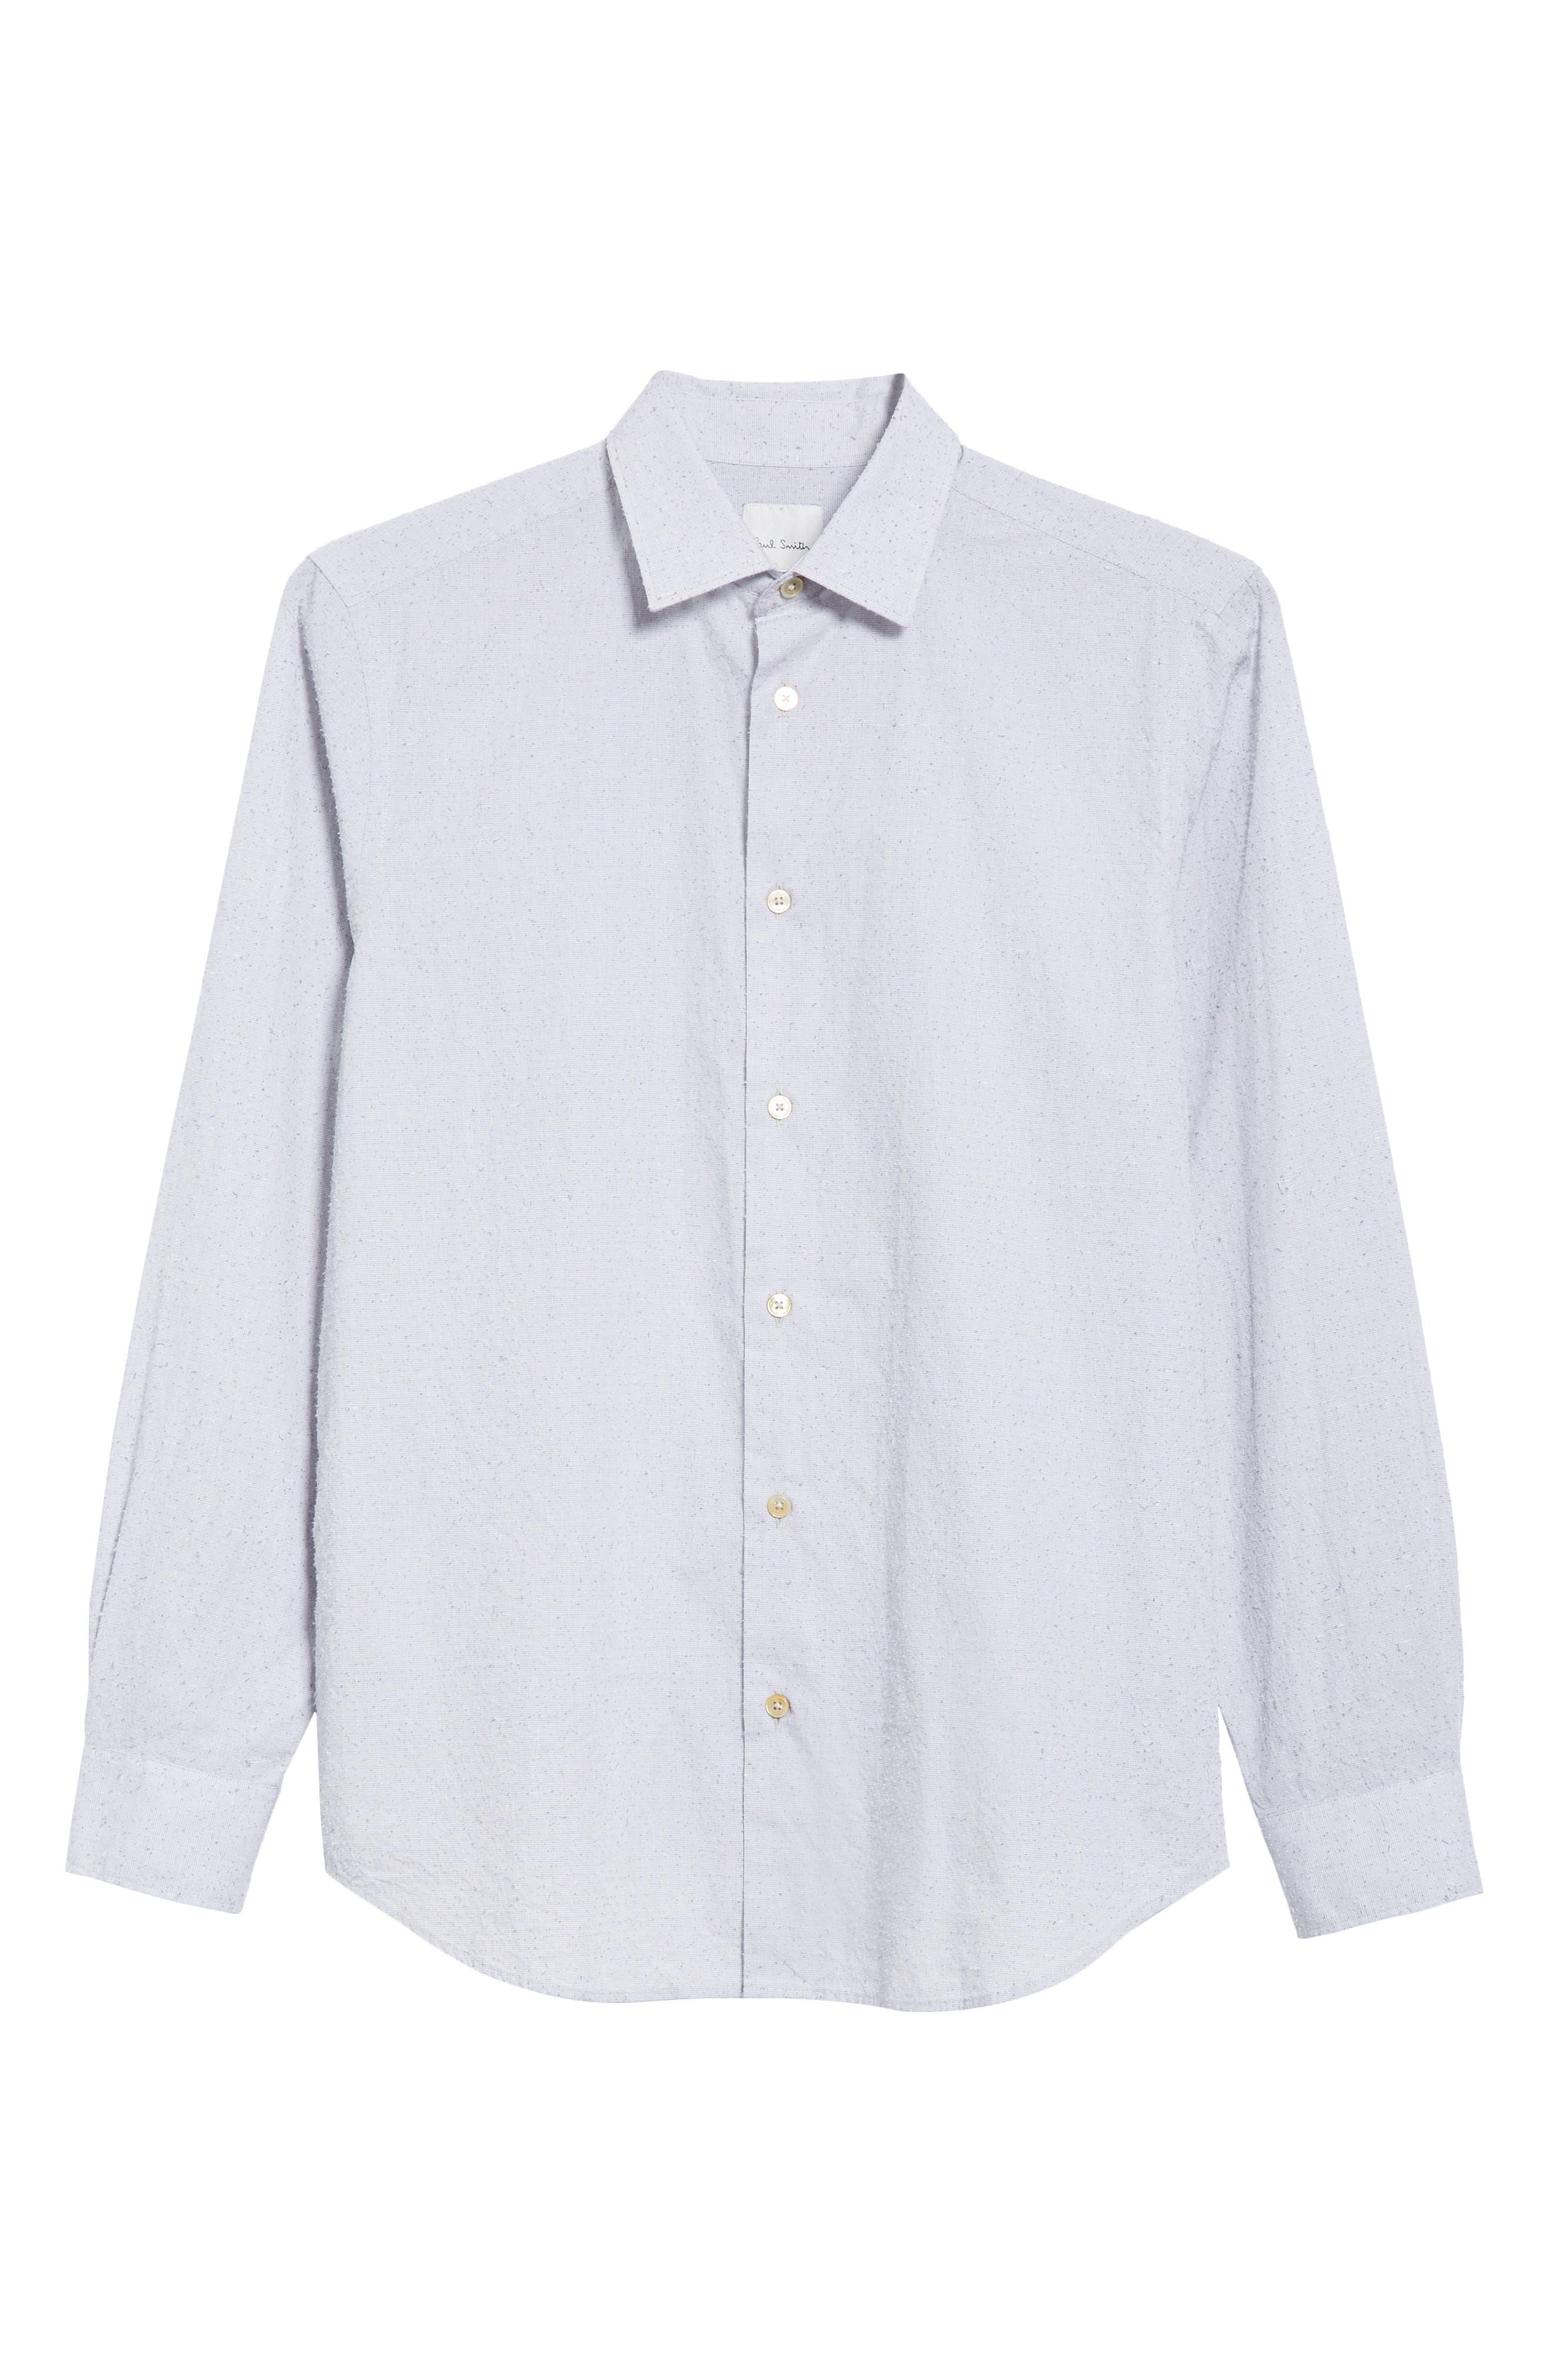 Nep Dot Woven Shirt,                             Alternate thumbnail 6, color,